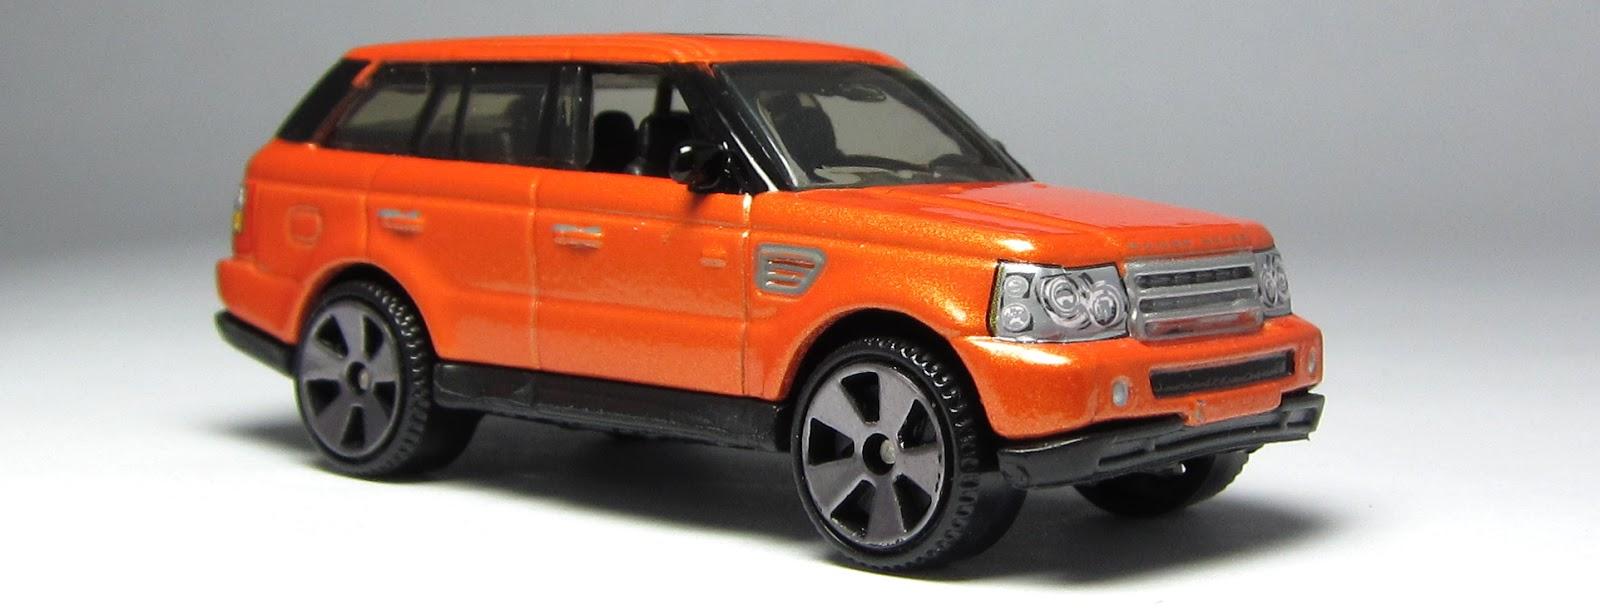 Hot Wheels Suvs Html Autos Weblog